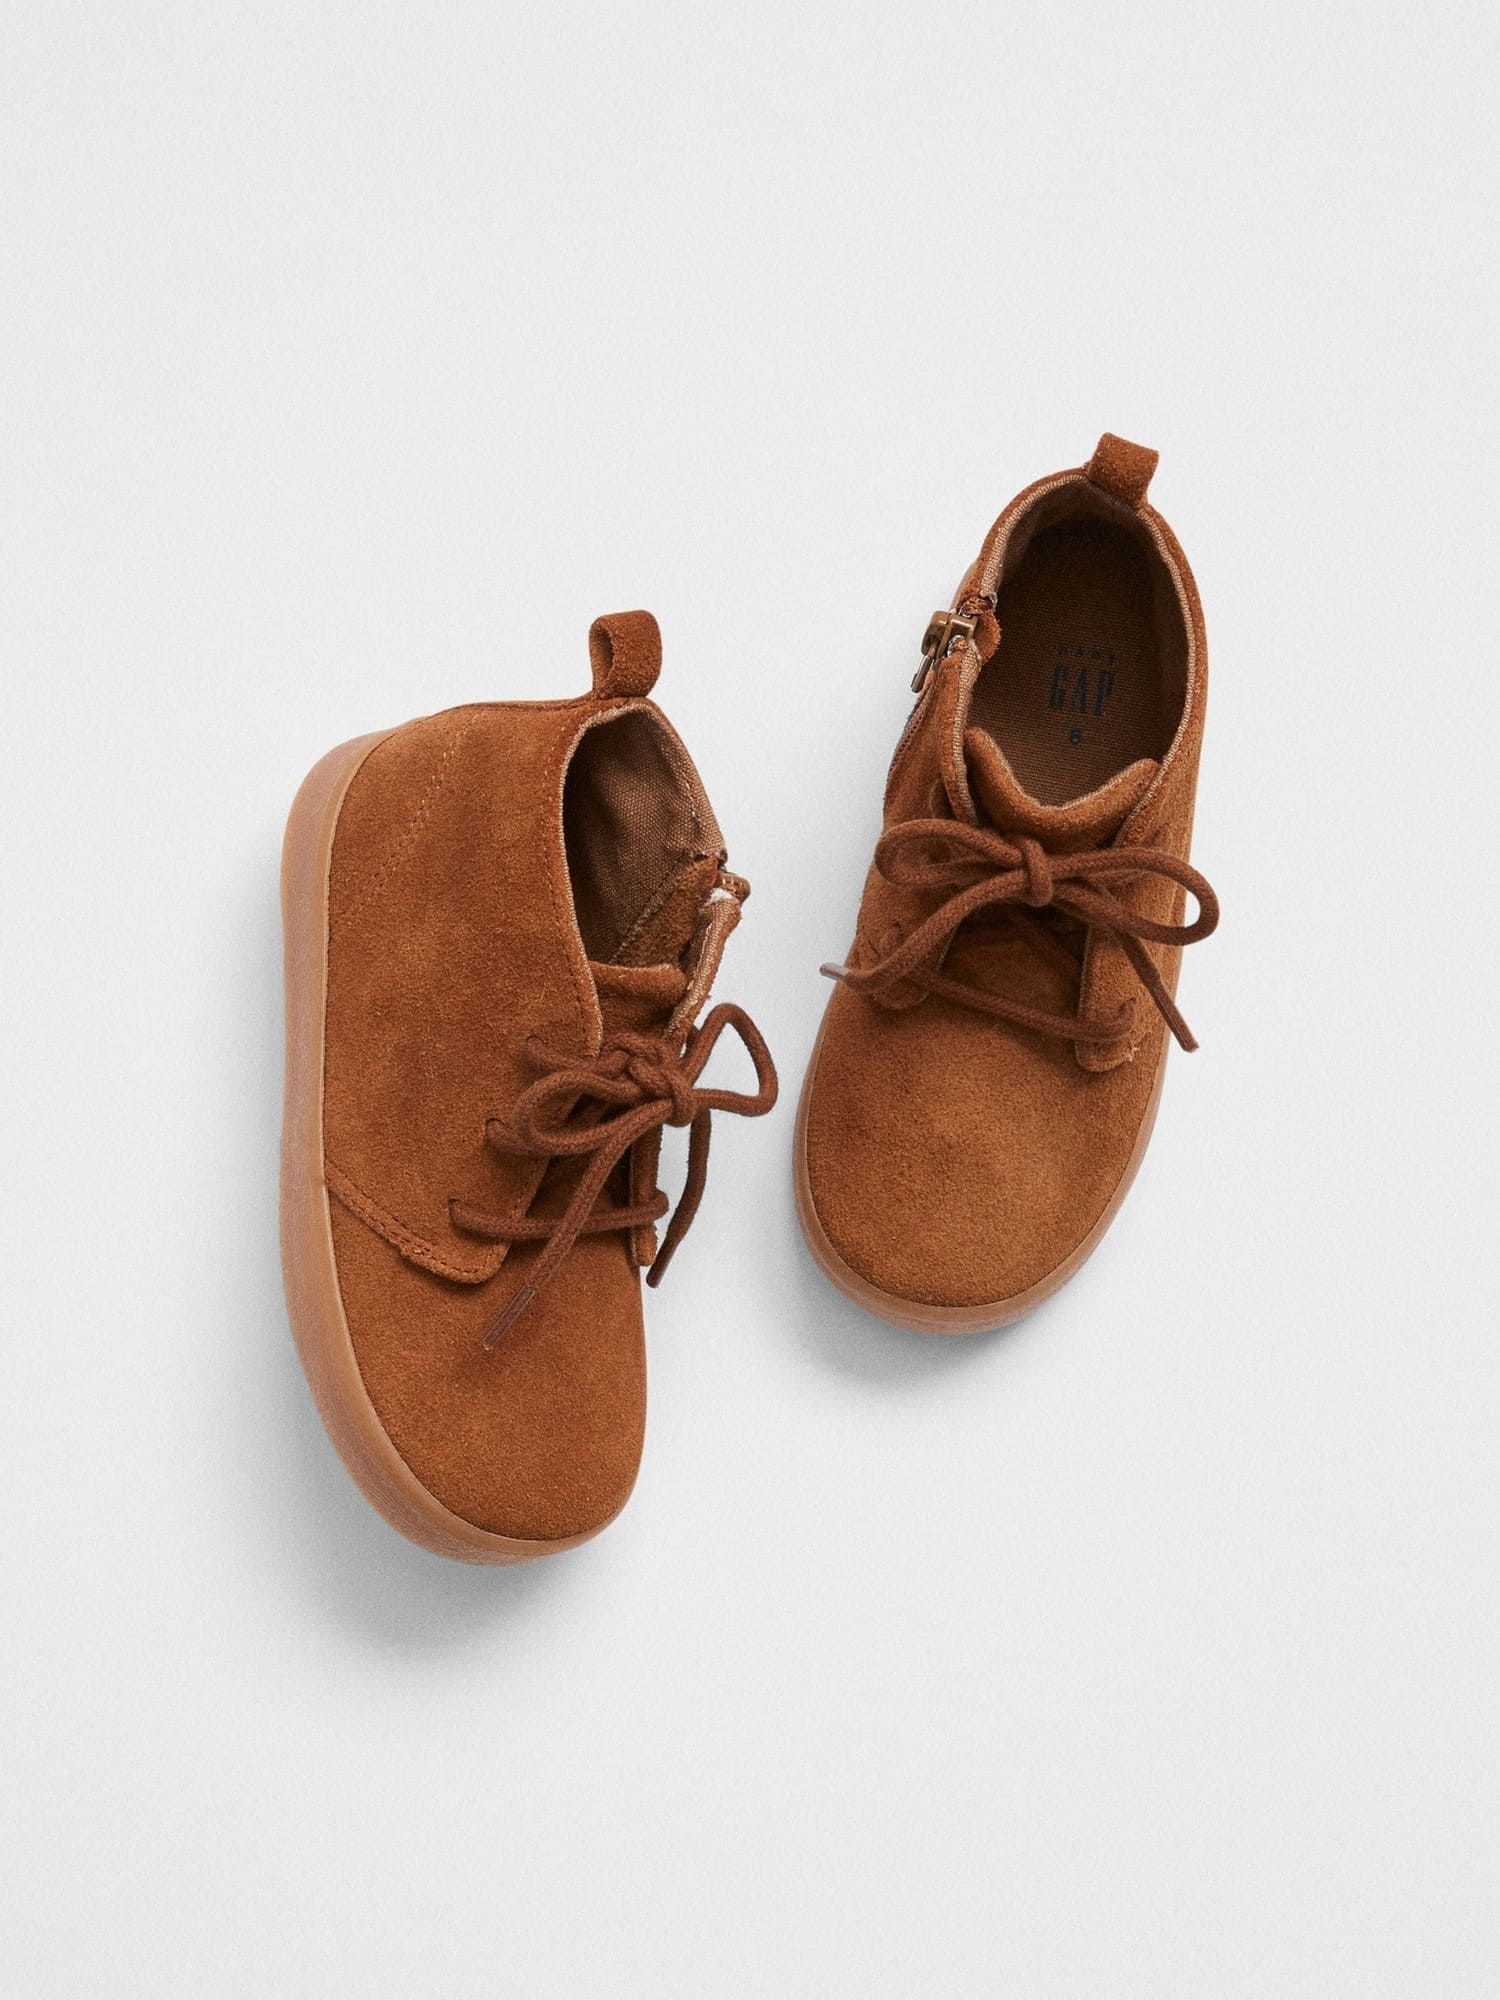 05e2b9c0f617d Toddler Boy Shoes, Baby Boy Shoes, Toddler Boy Fashion, Toddler Boy Outfits,